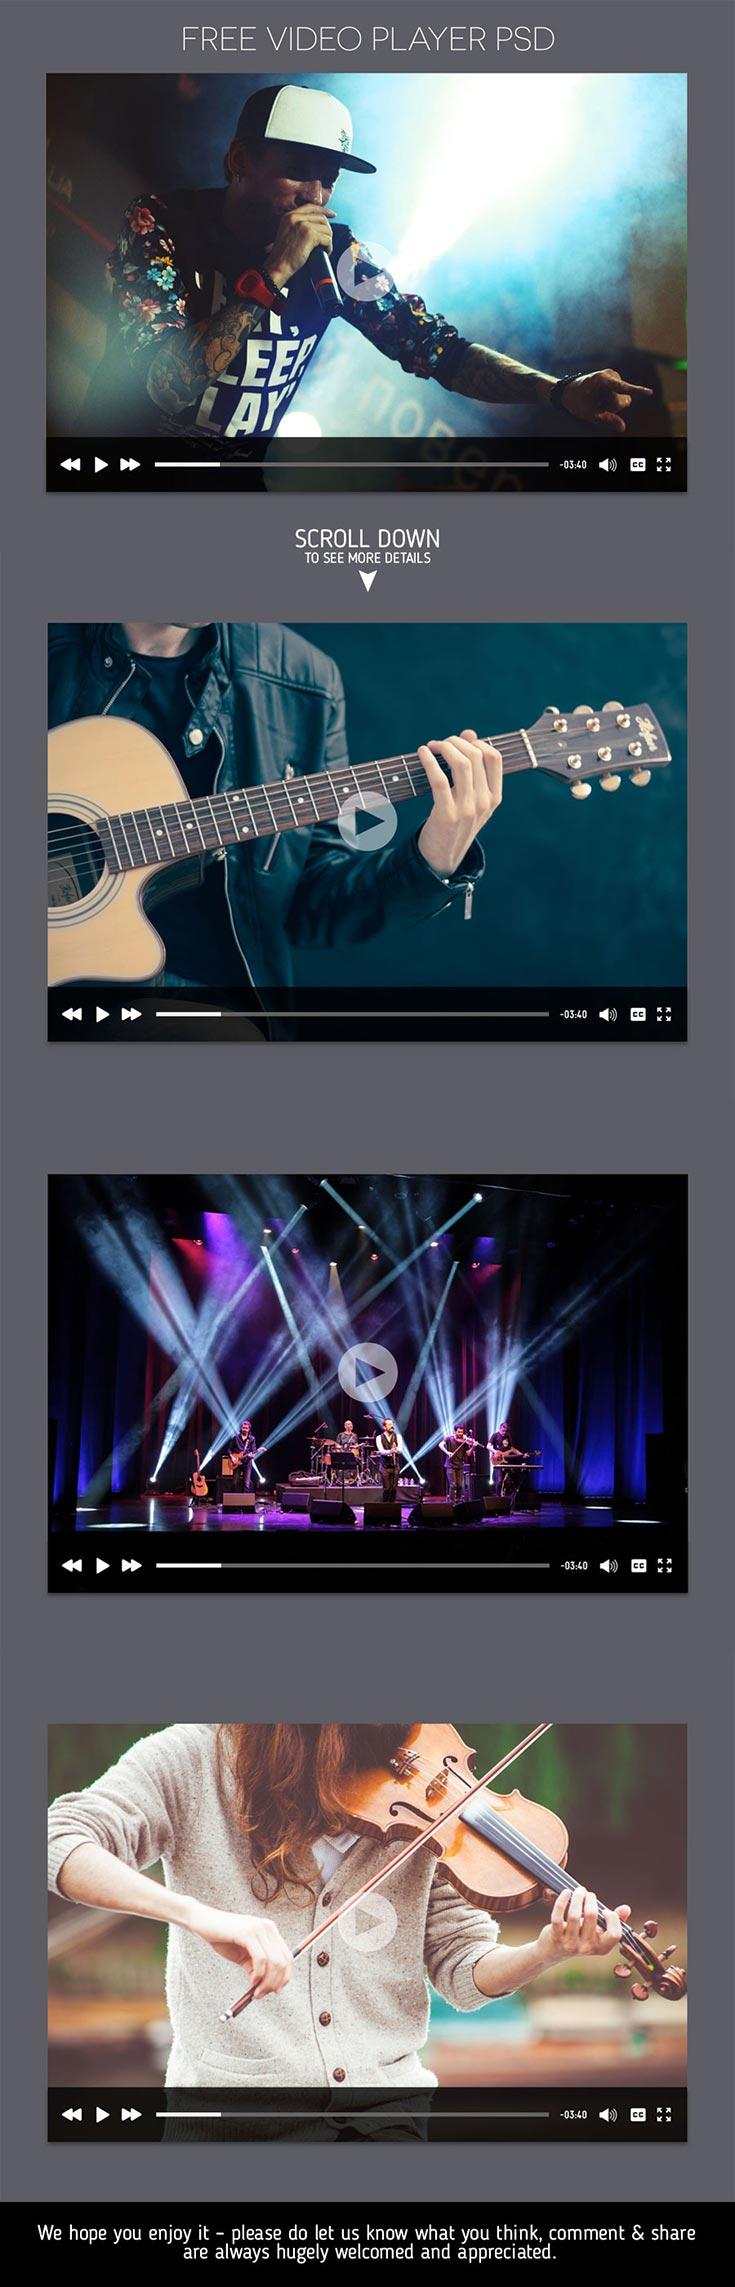 Free Video Player PSD